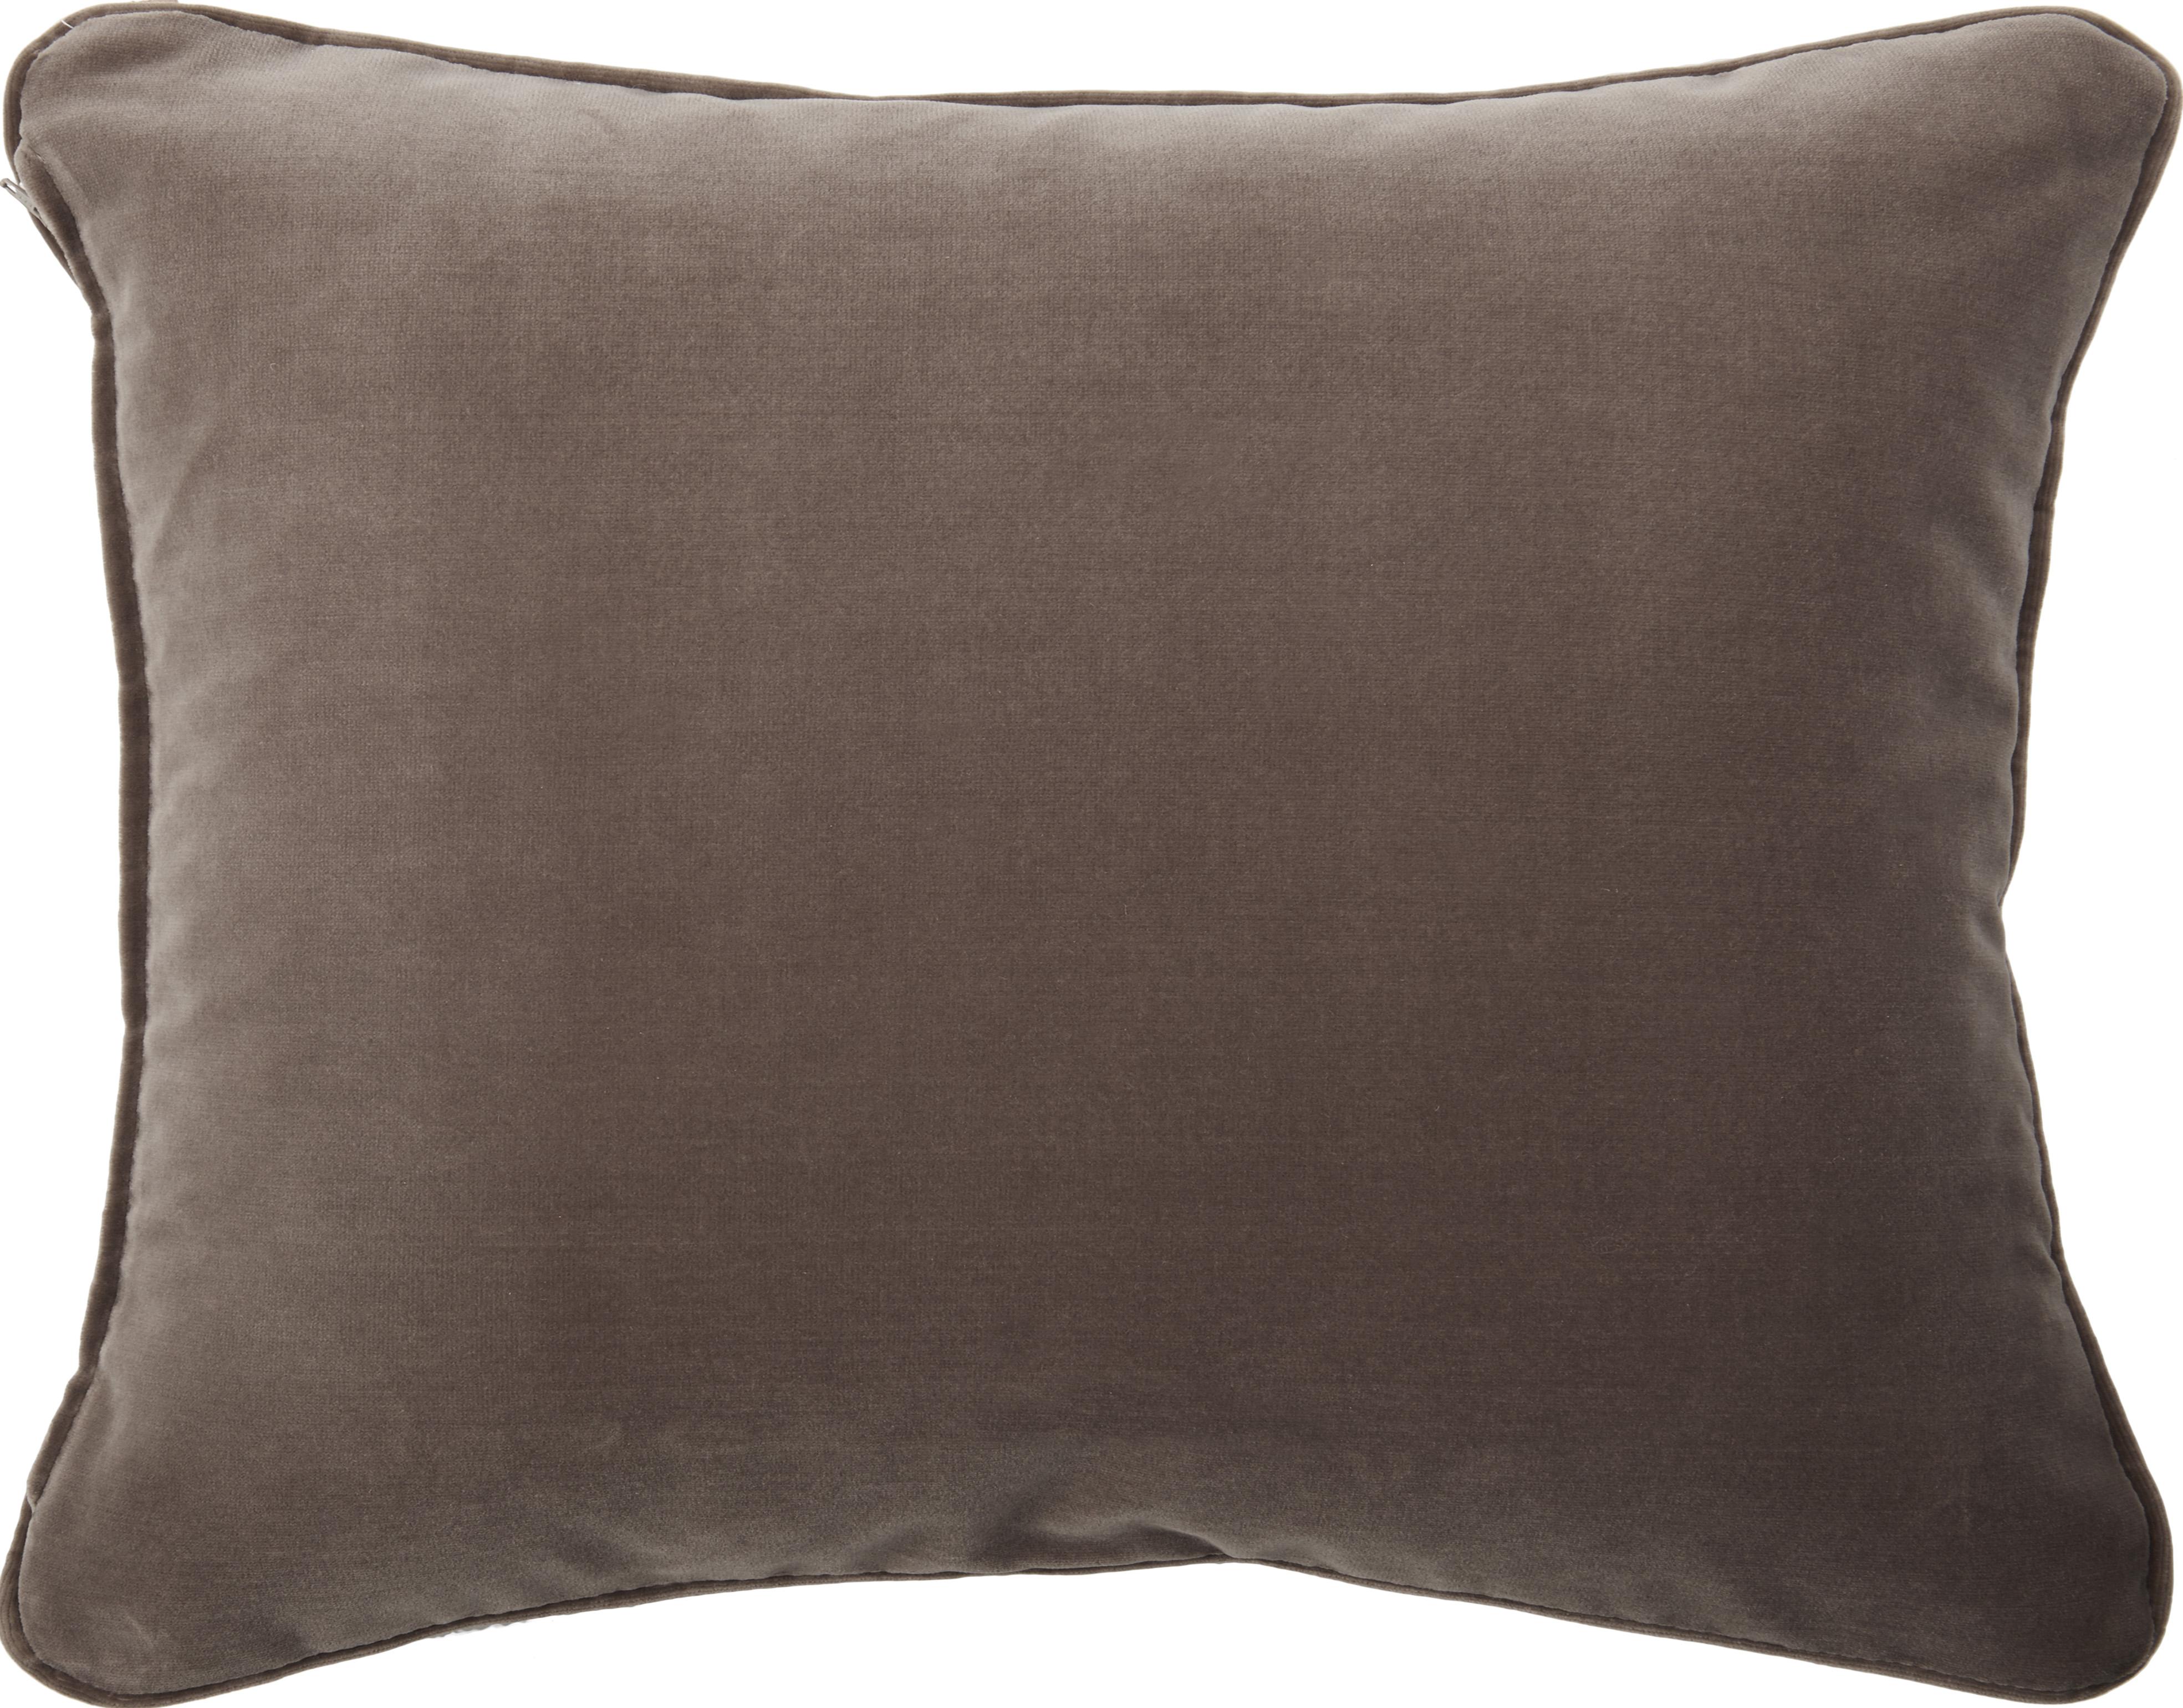 Florence Cushion 35x45cm, Isla Otter